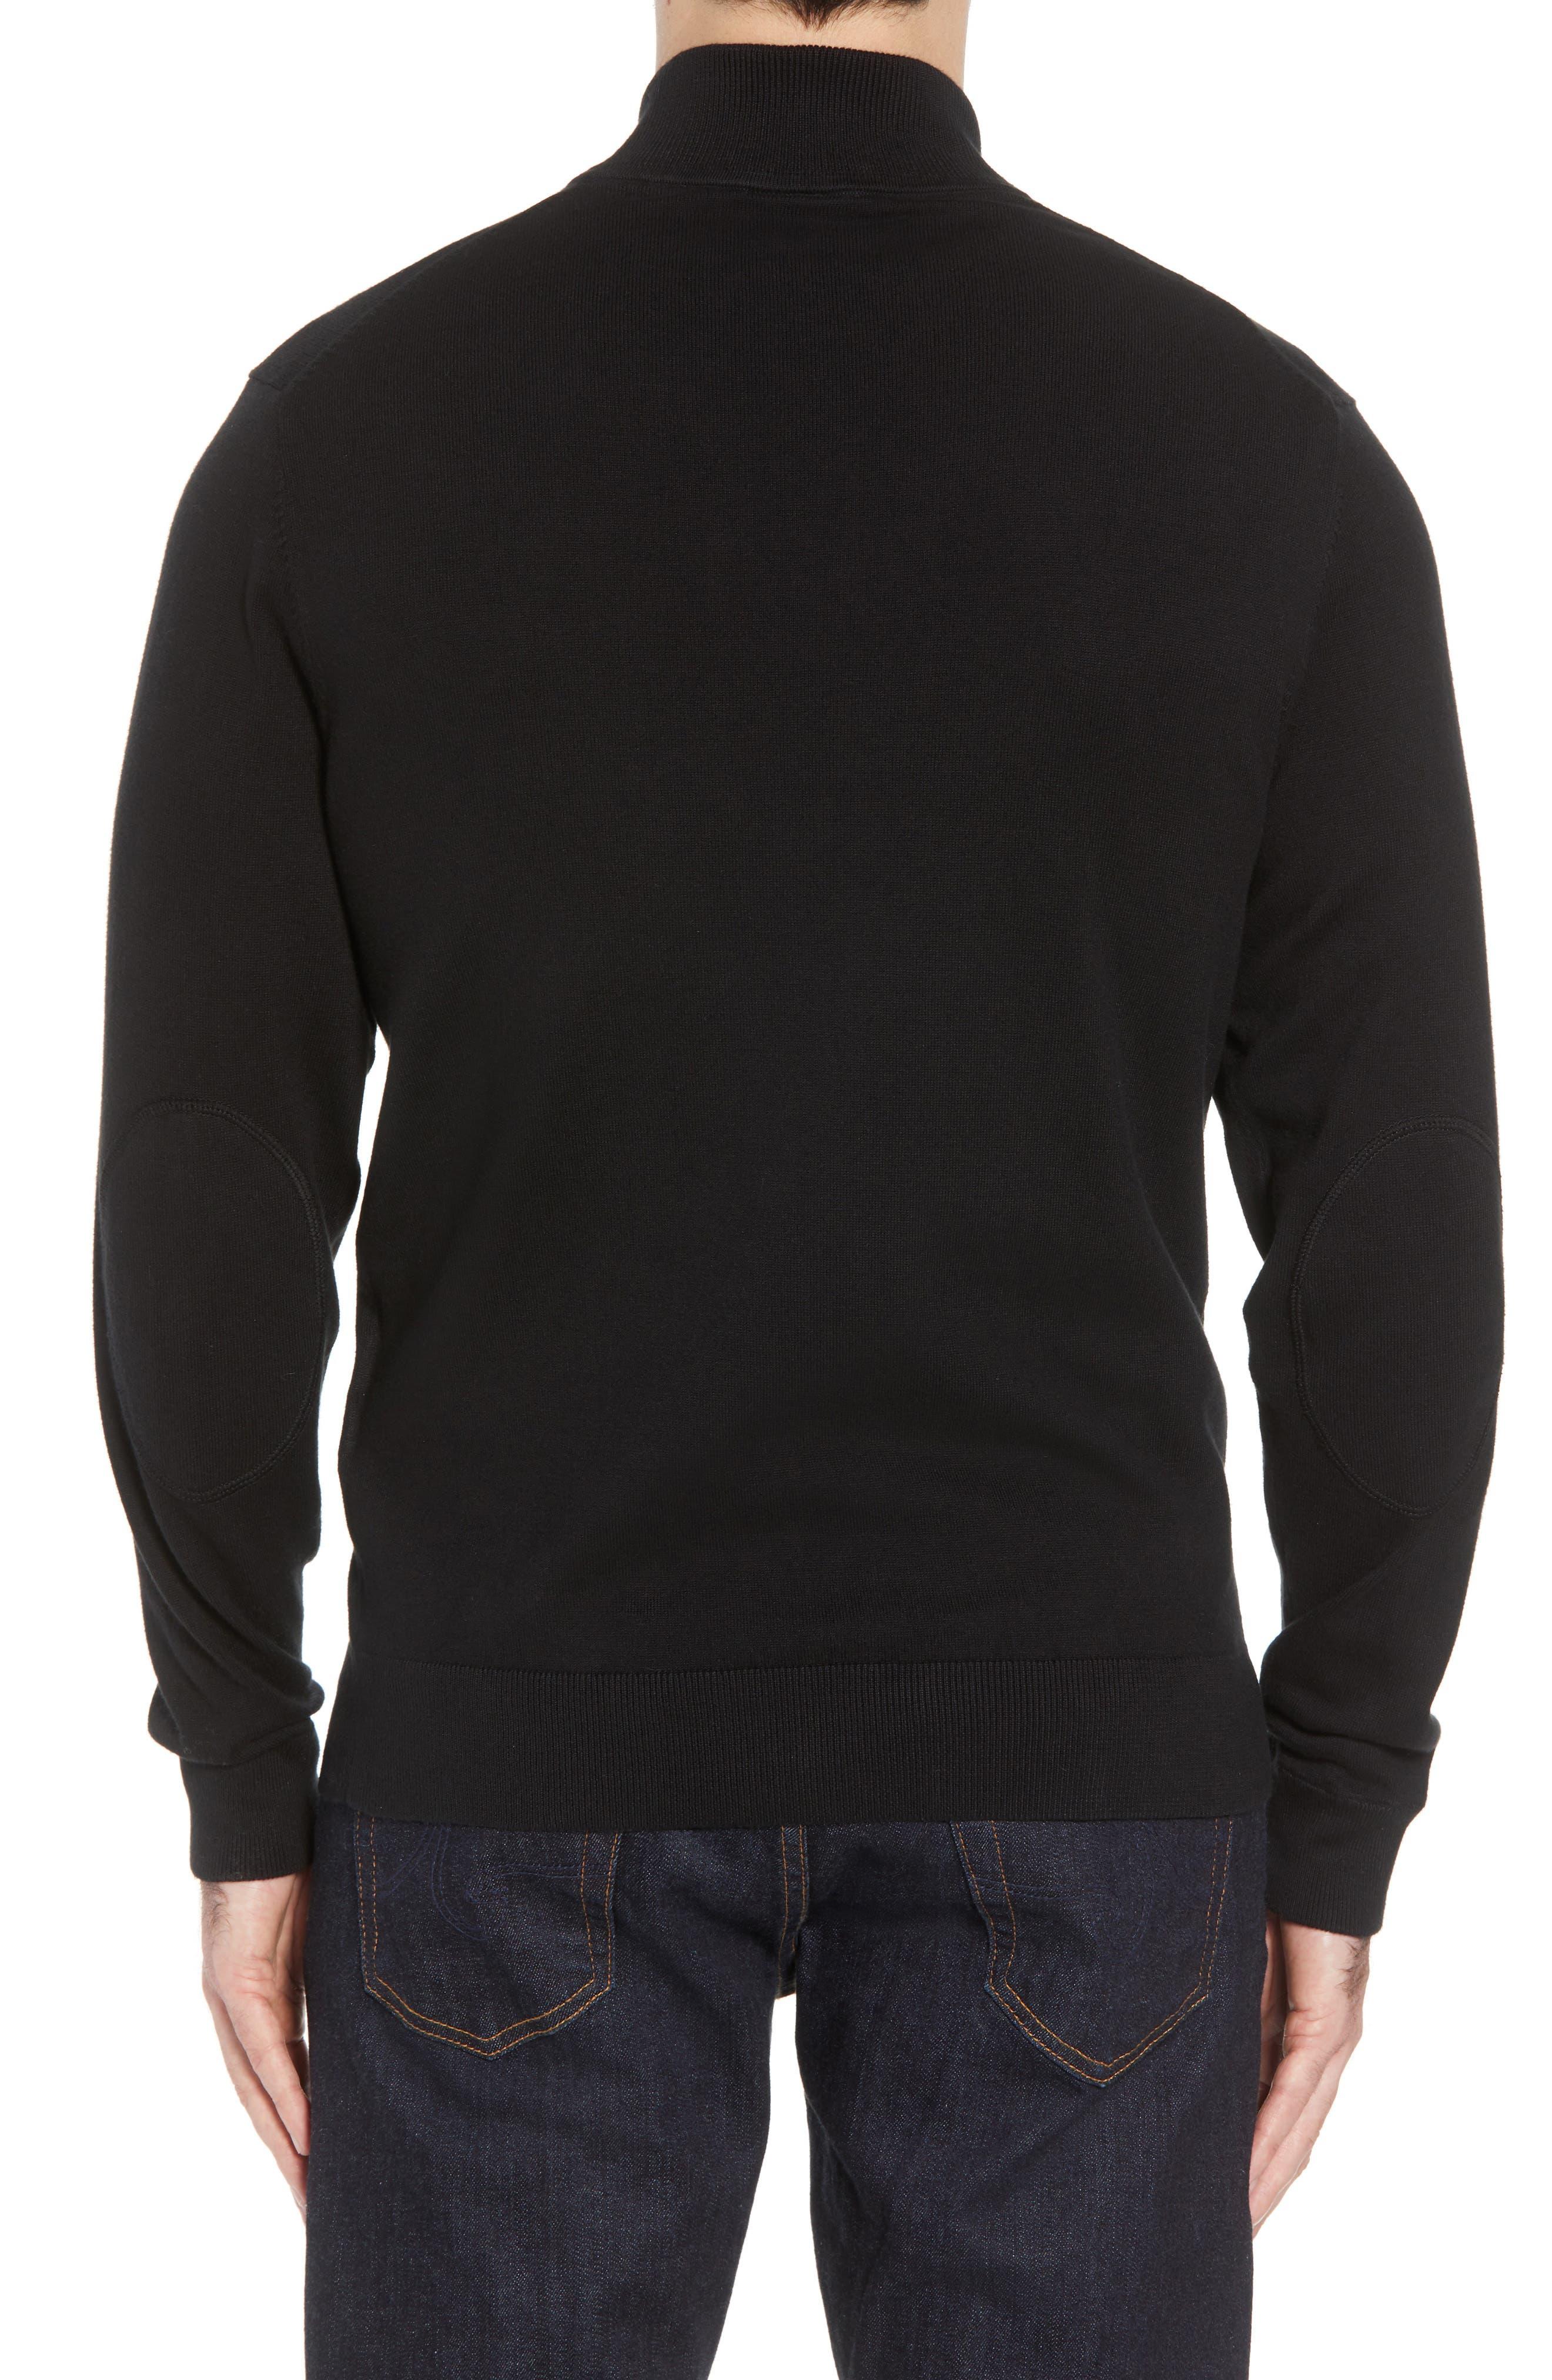 Arizona Cardinals - Lakemont Regular Fit Quarter Zip Sweater,                             Alternate thumbnail 2, color,                             BLACK